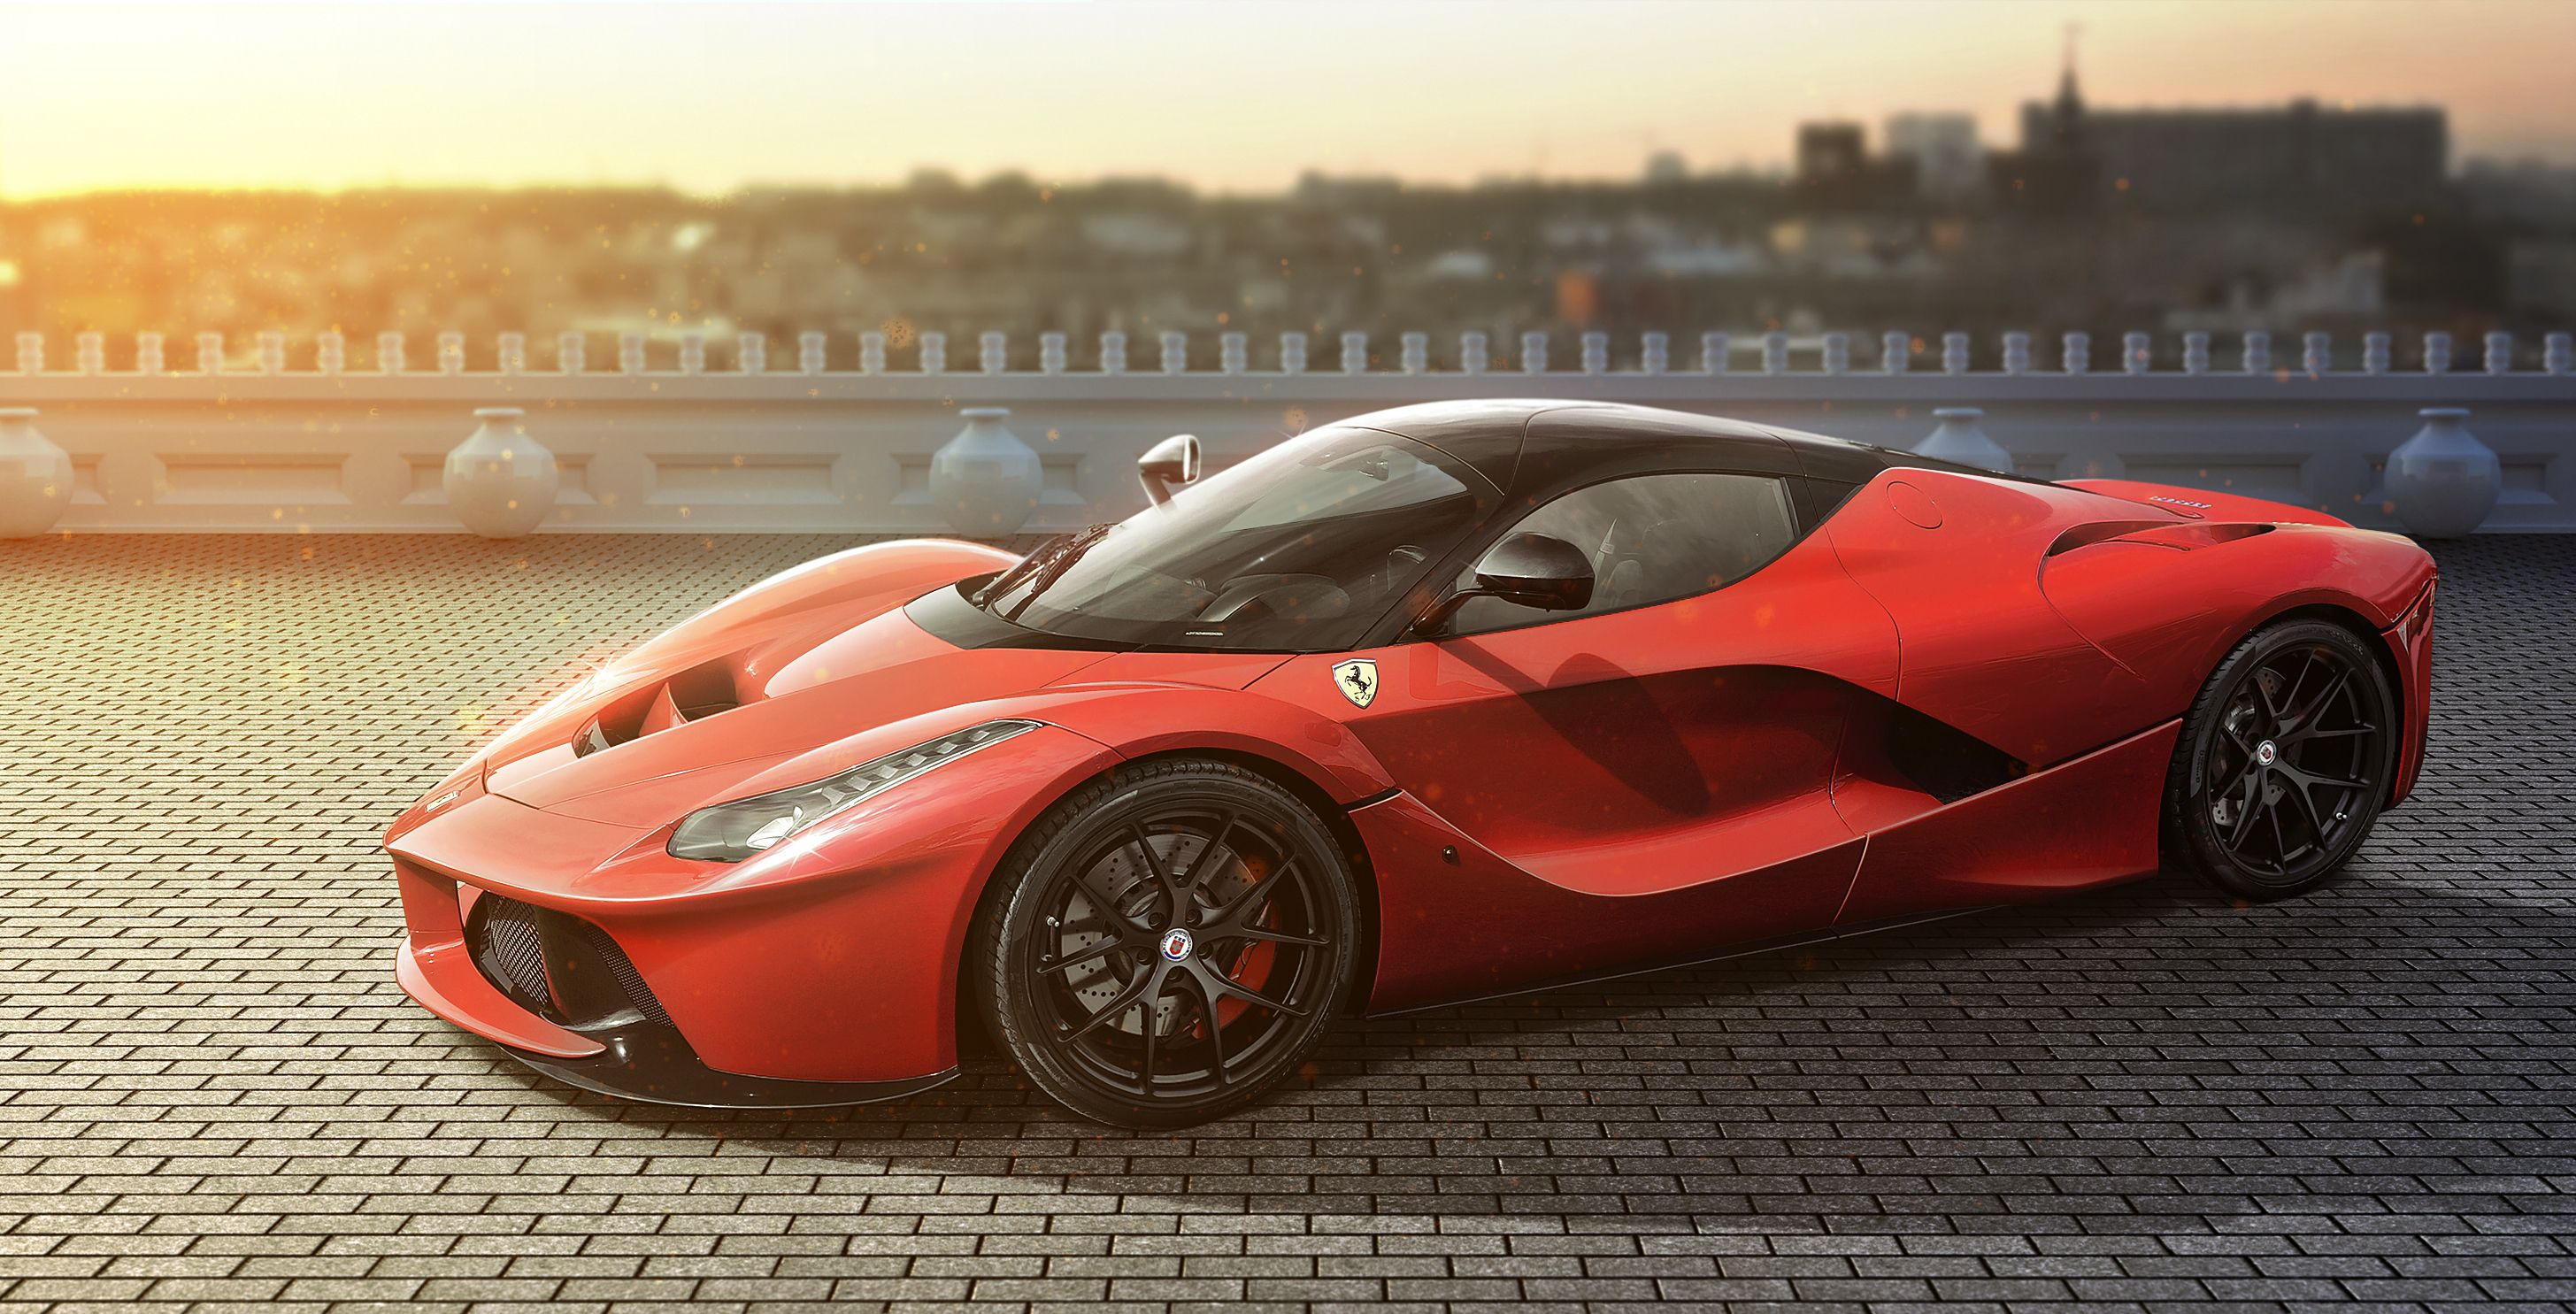 Skachat Oboi Ferrari Laferrari By Jackdarton Hre Performance Wheels Razdel Ferrari V Razreshenii 2911x1485 Ferrari Laferrari Ferrari Super Cars